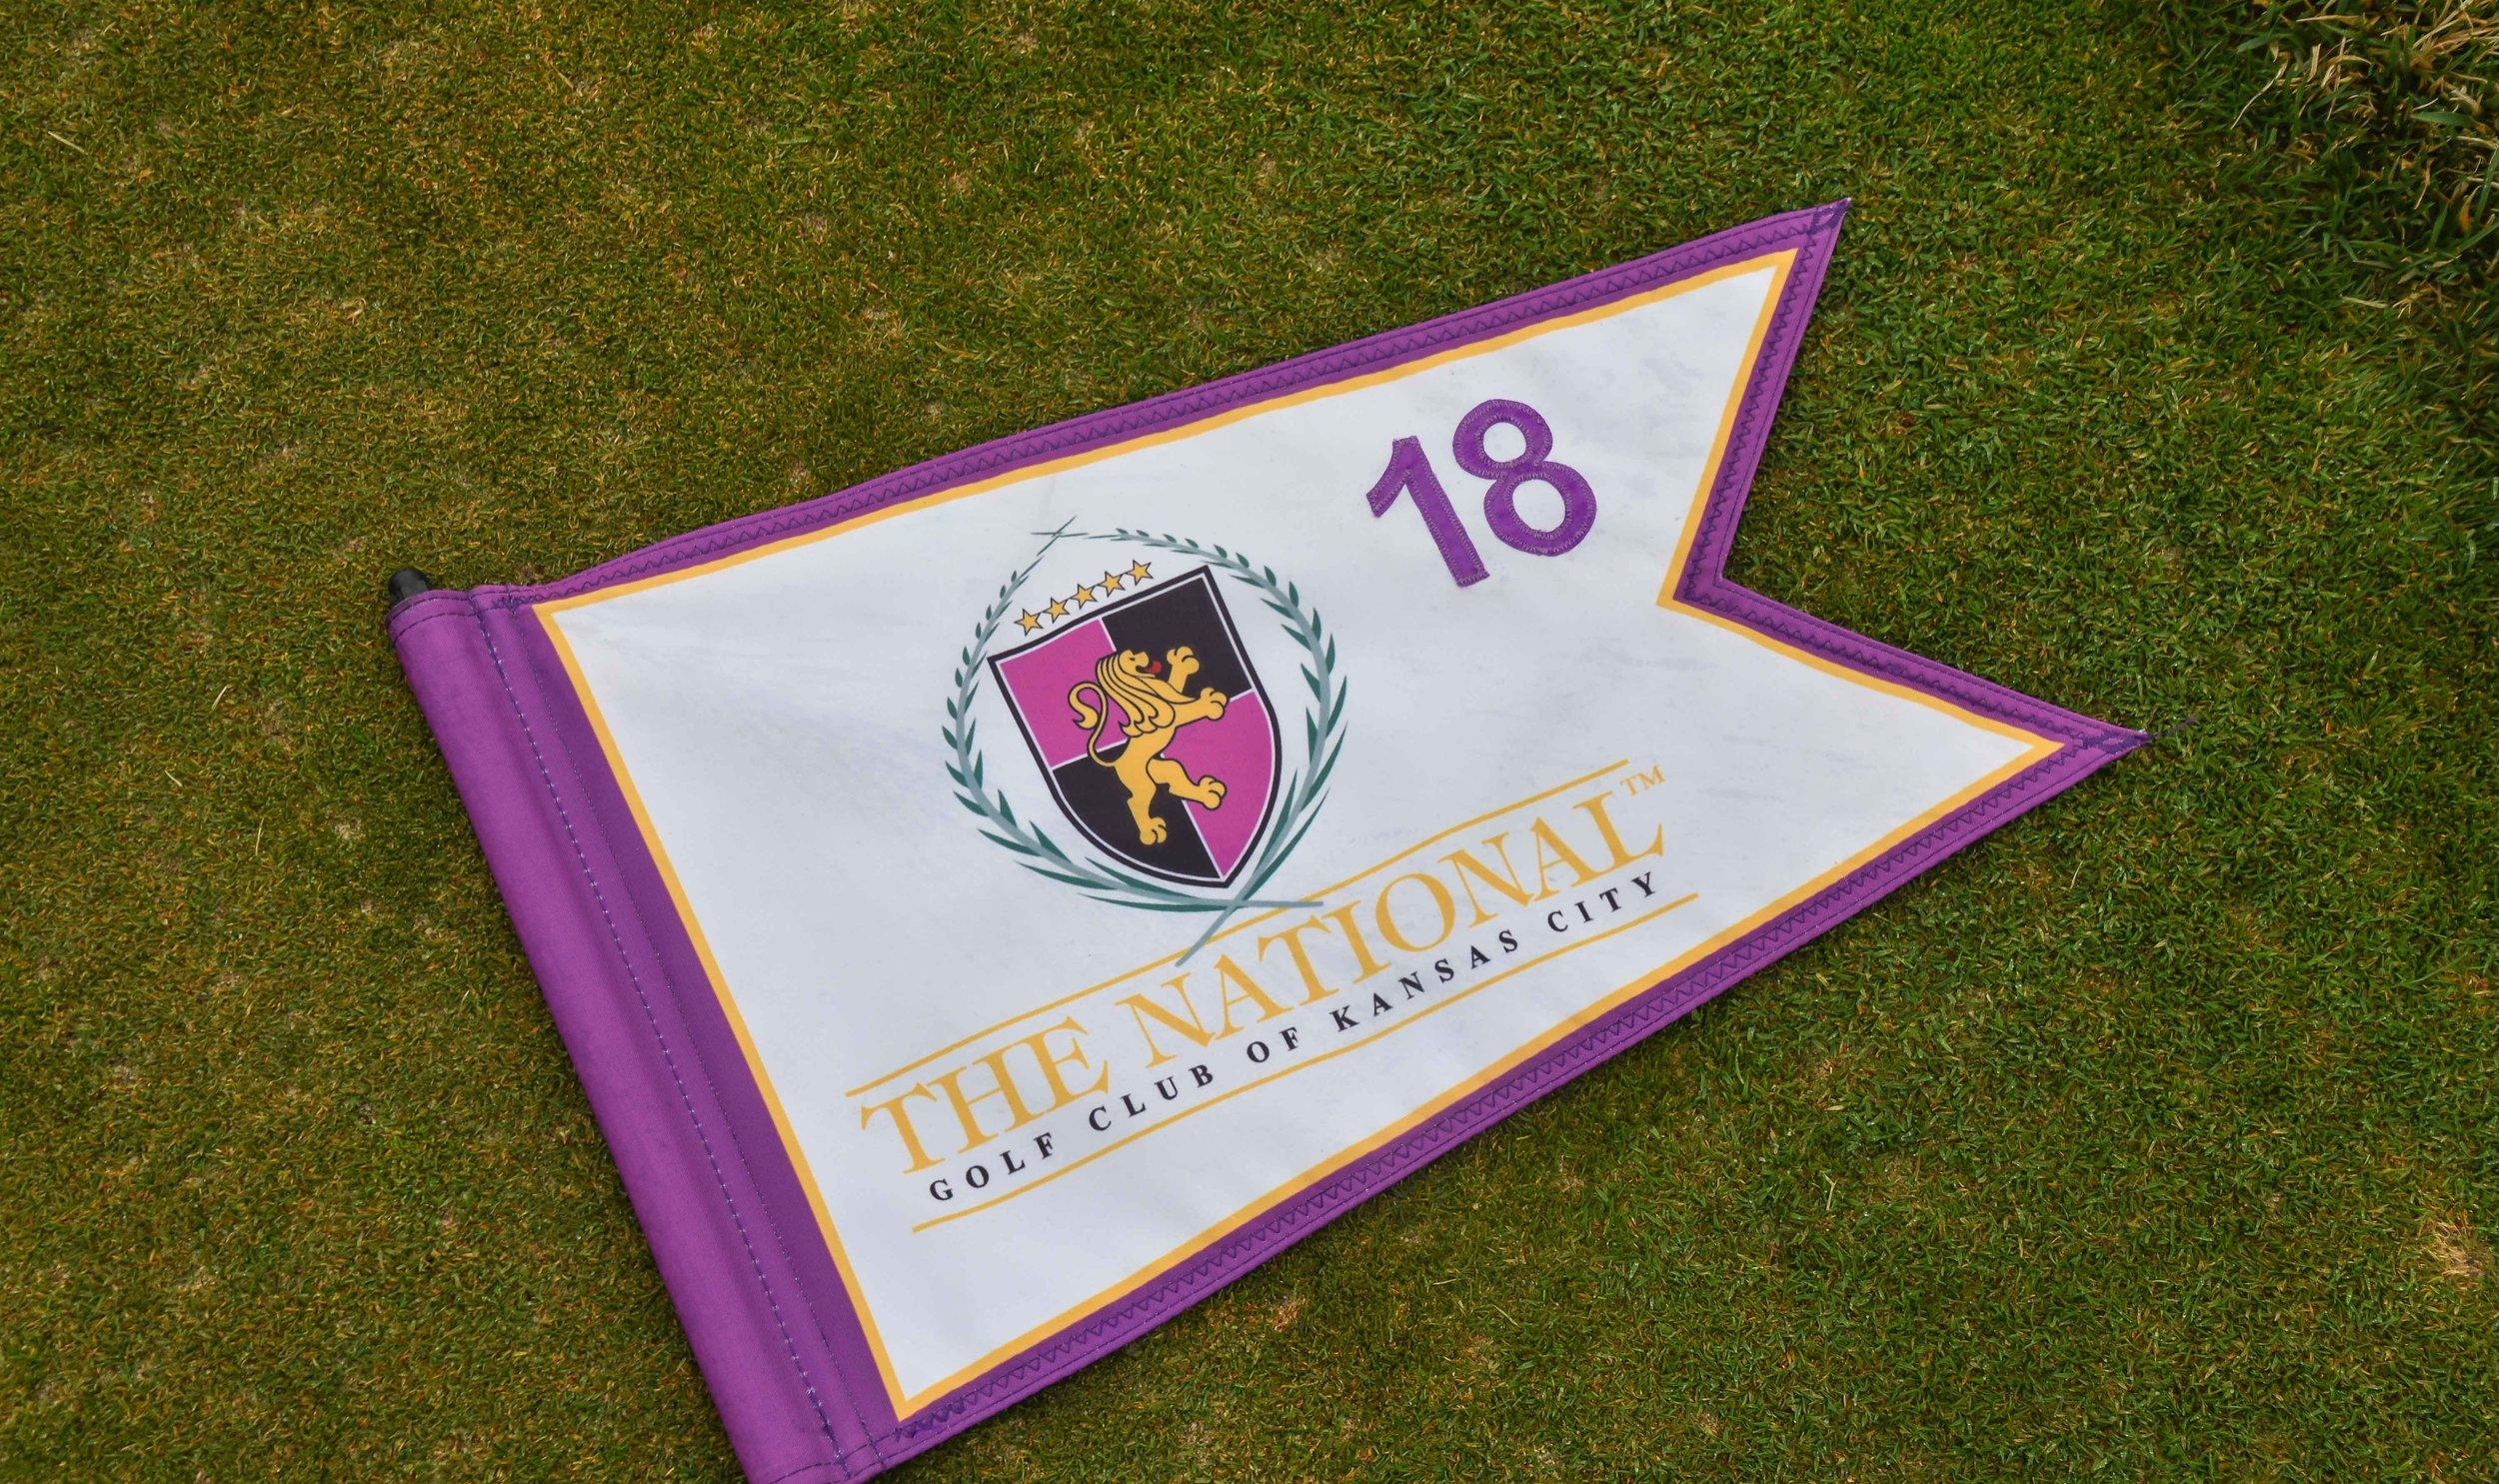 The National Golf Club of Kansas City1-76.jpg